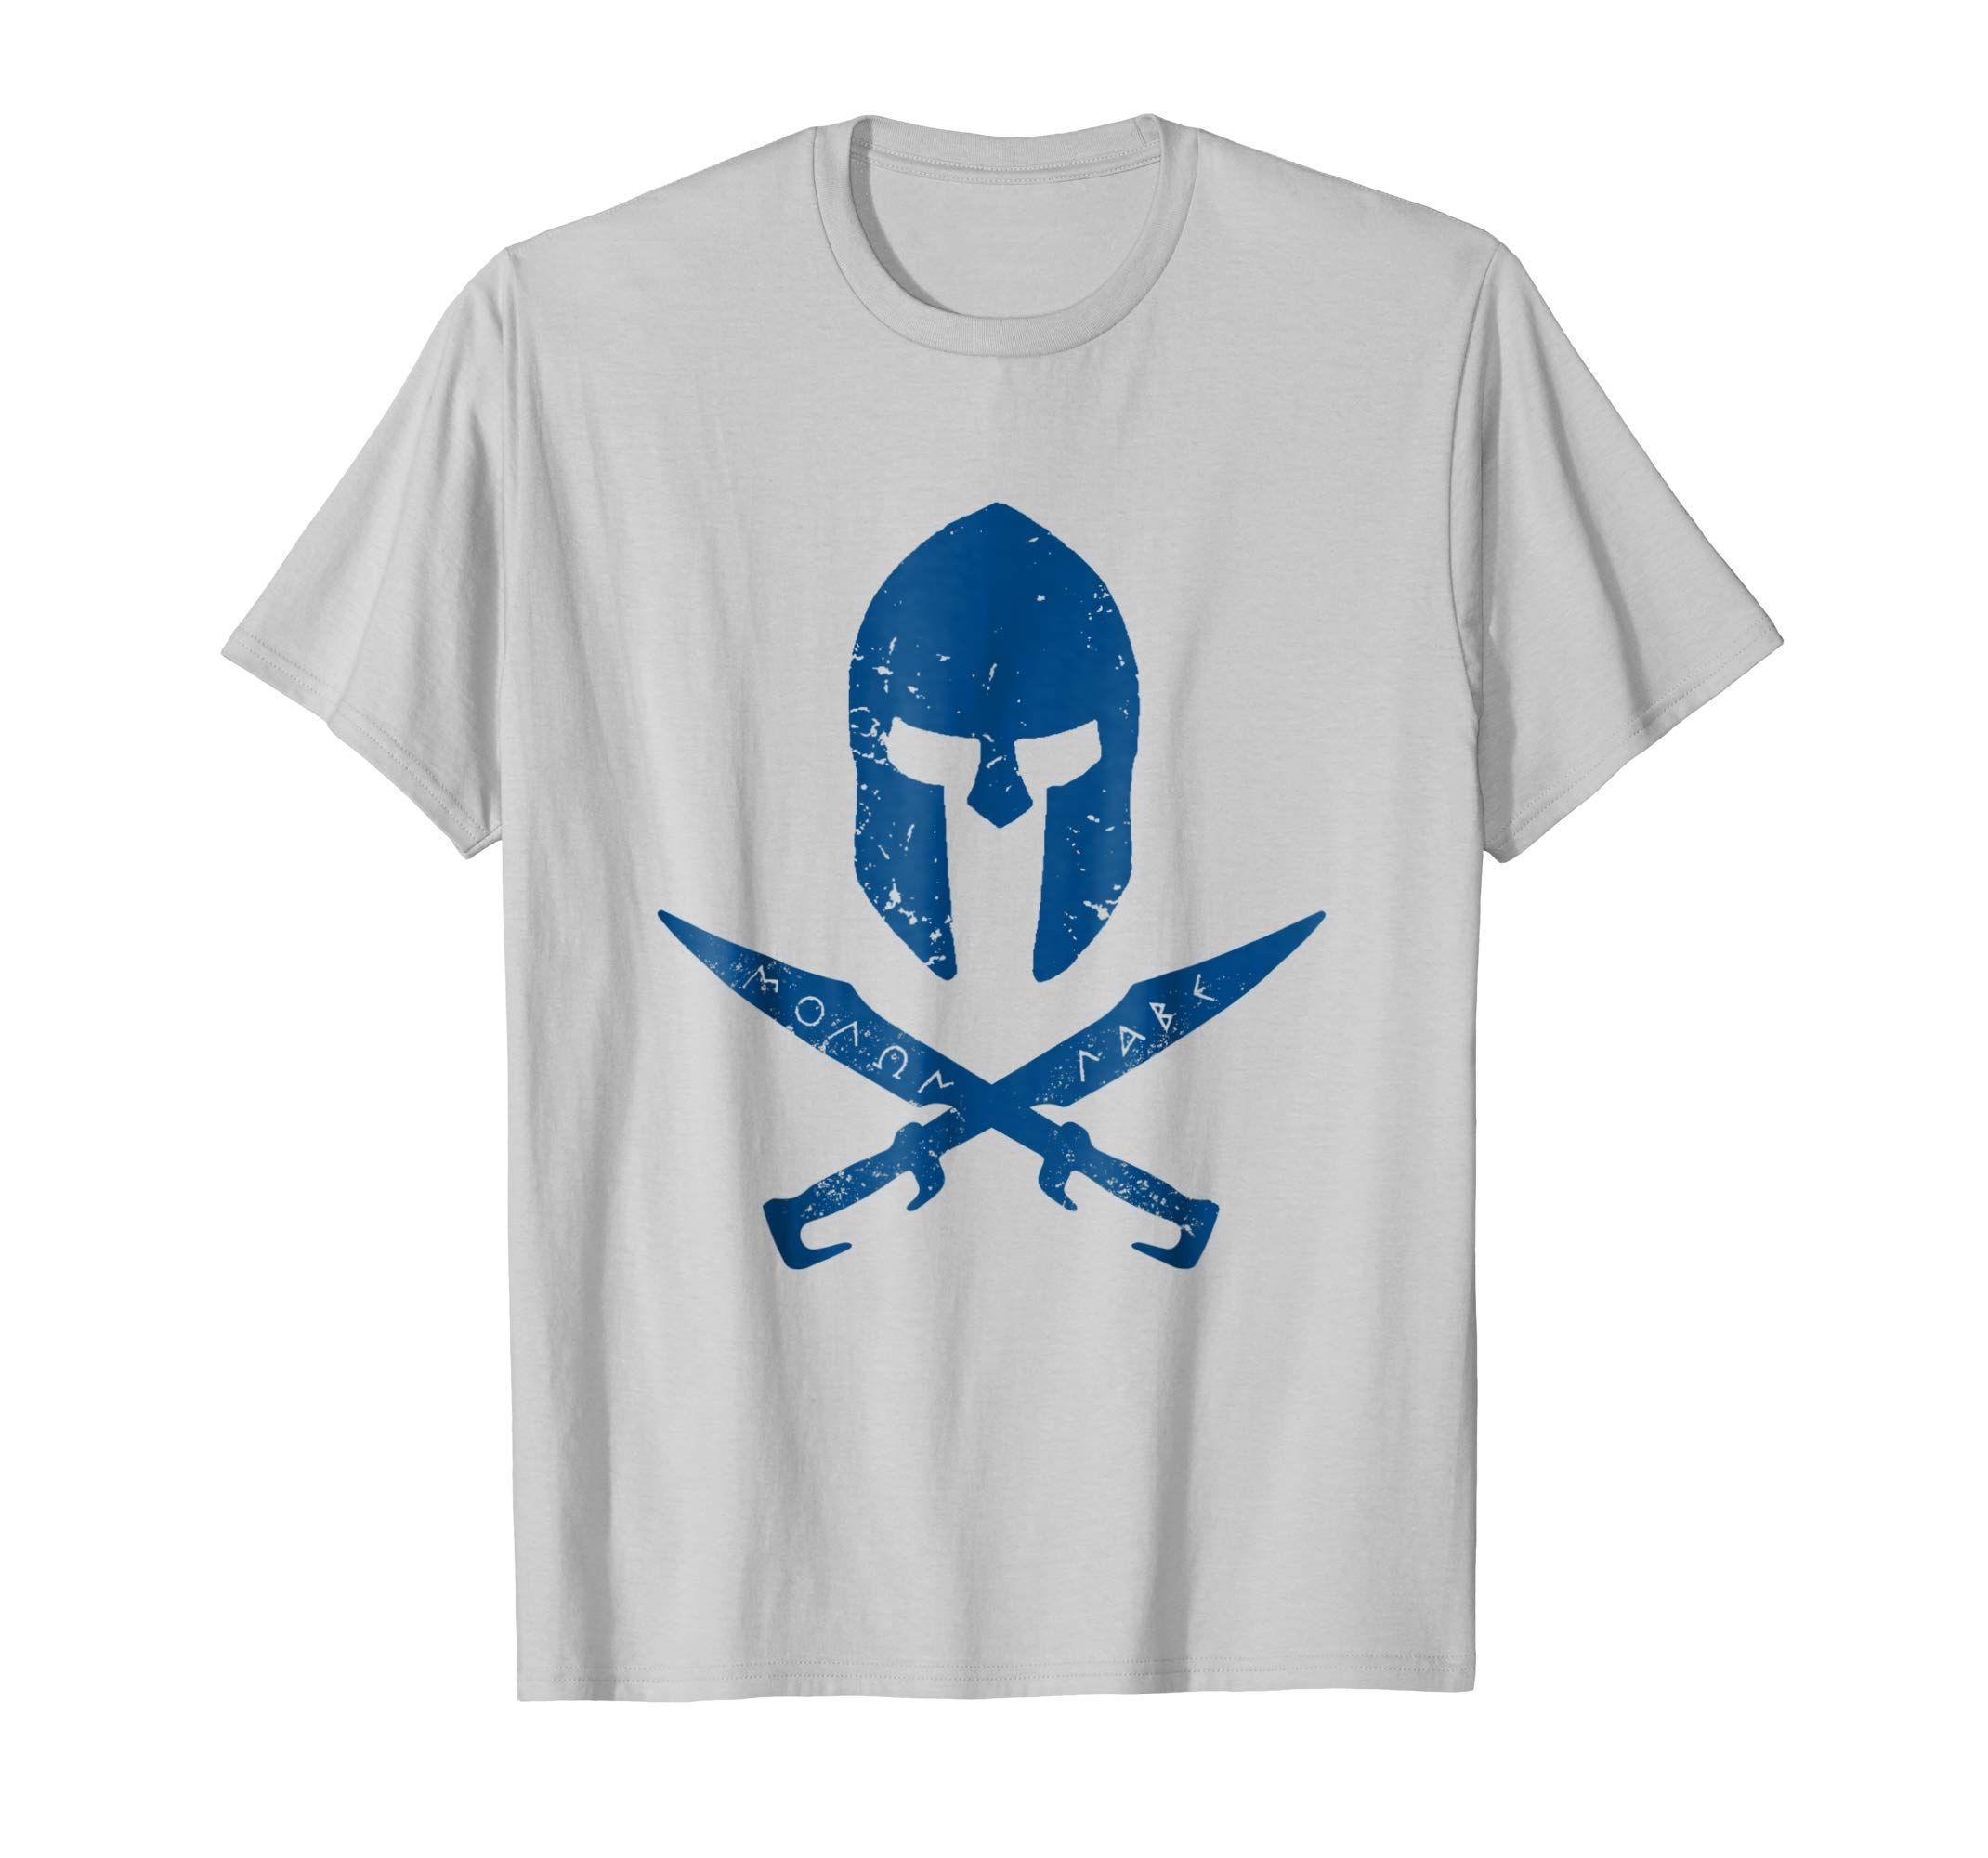 Sparte T-shirt Molon Labe Grèce tshirt